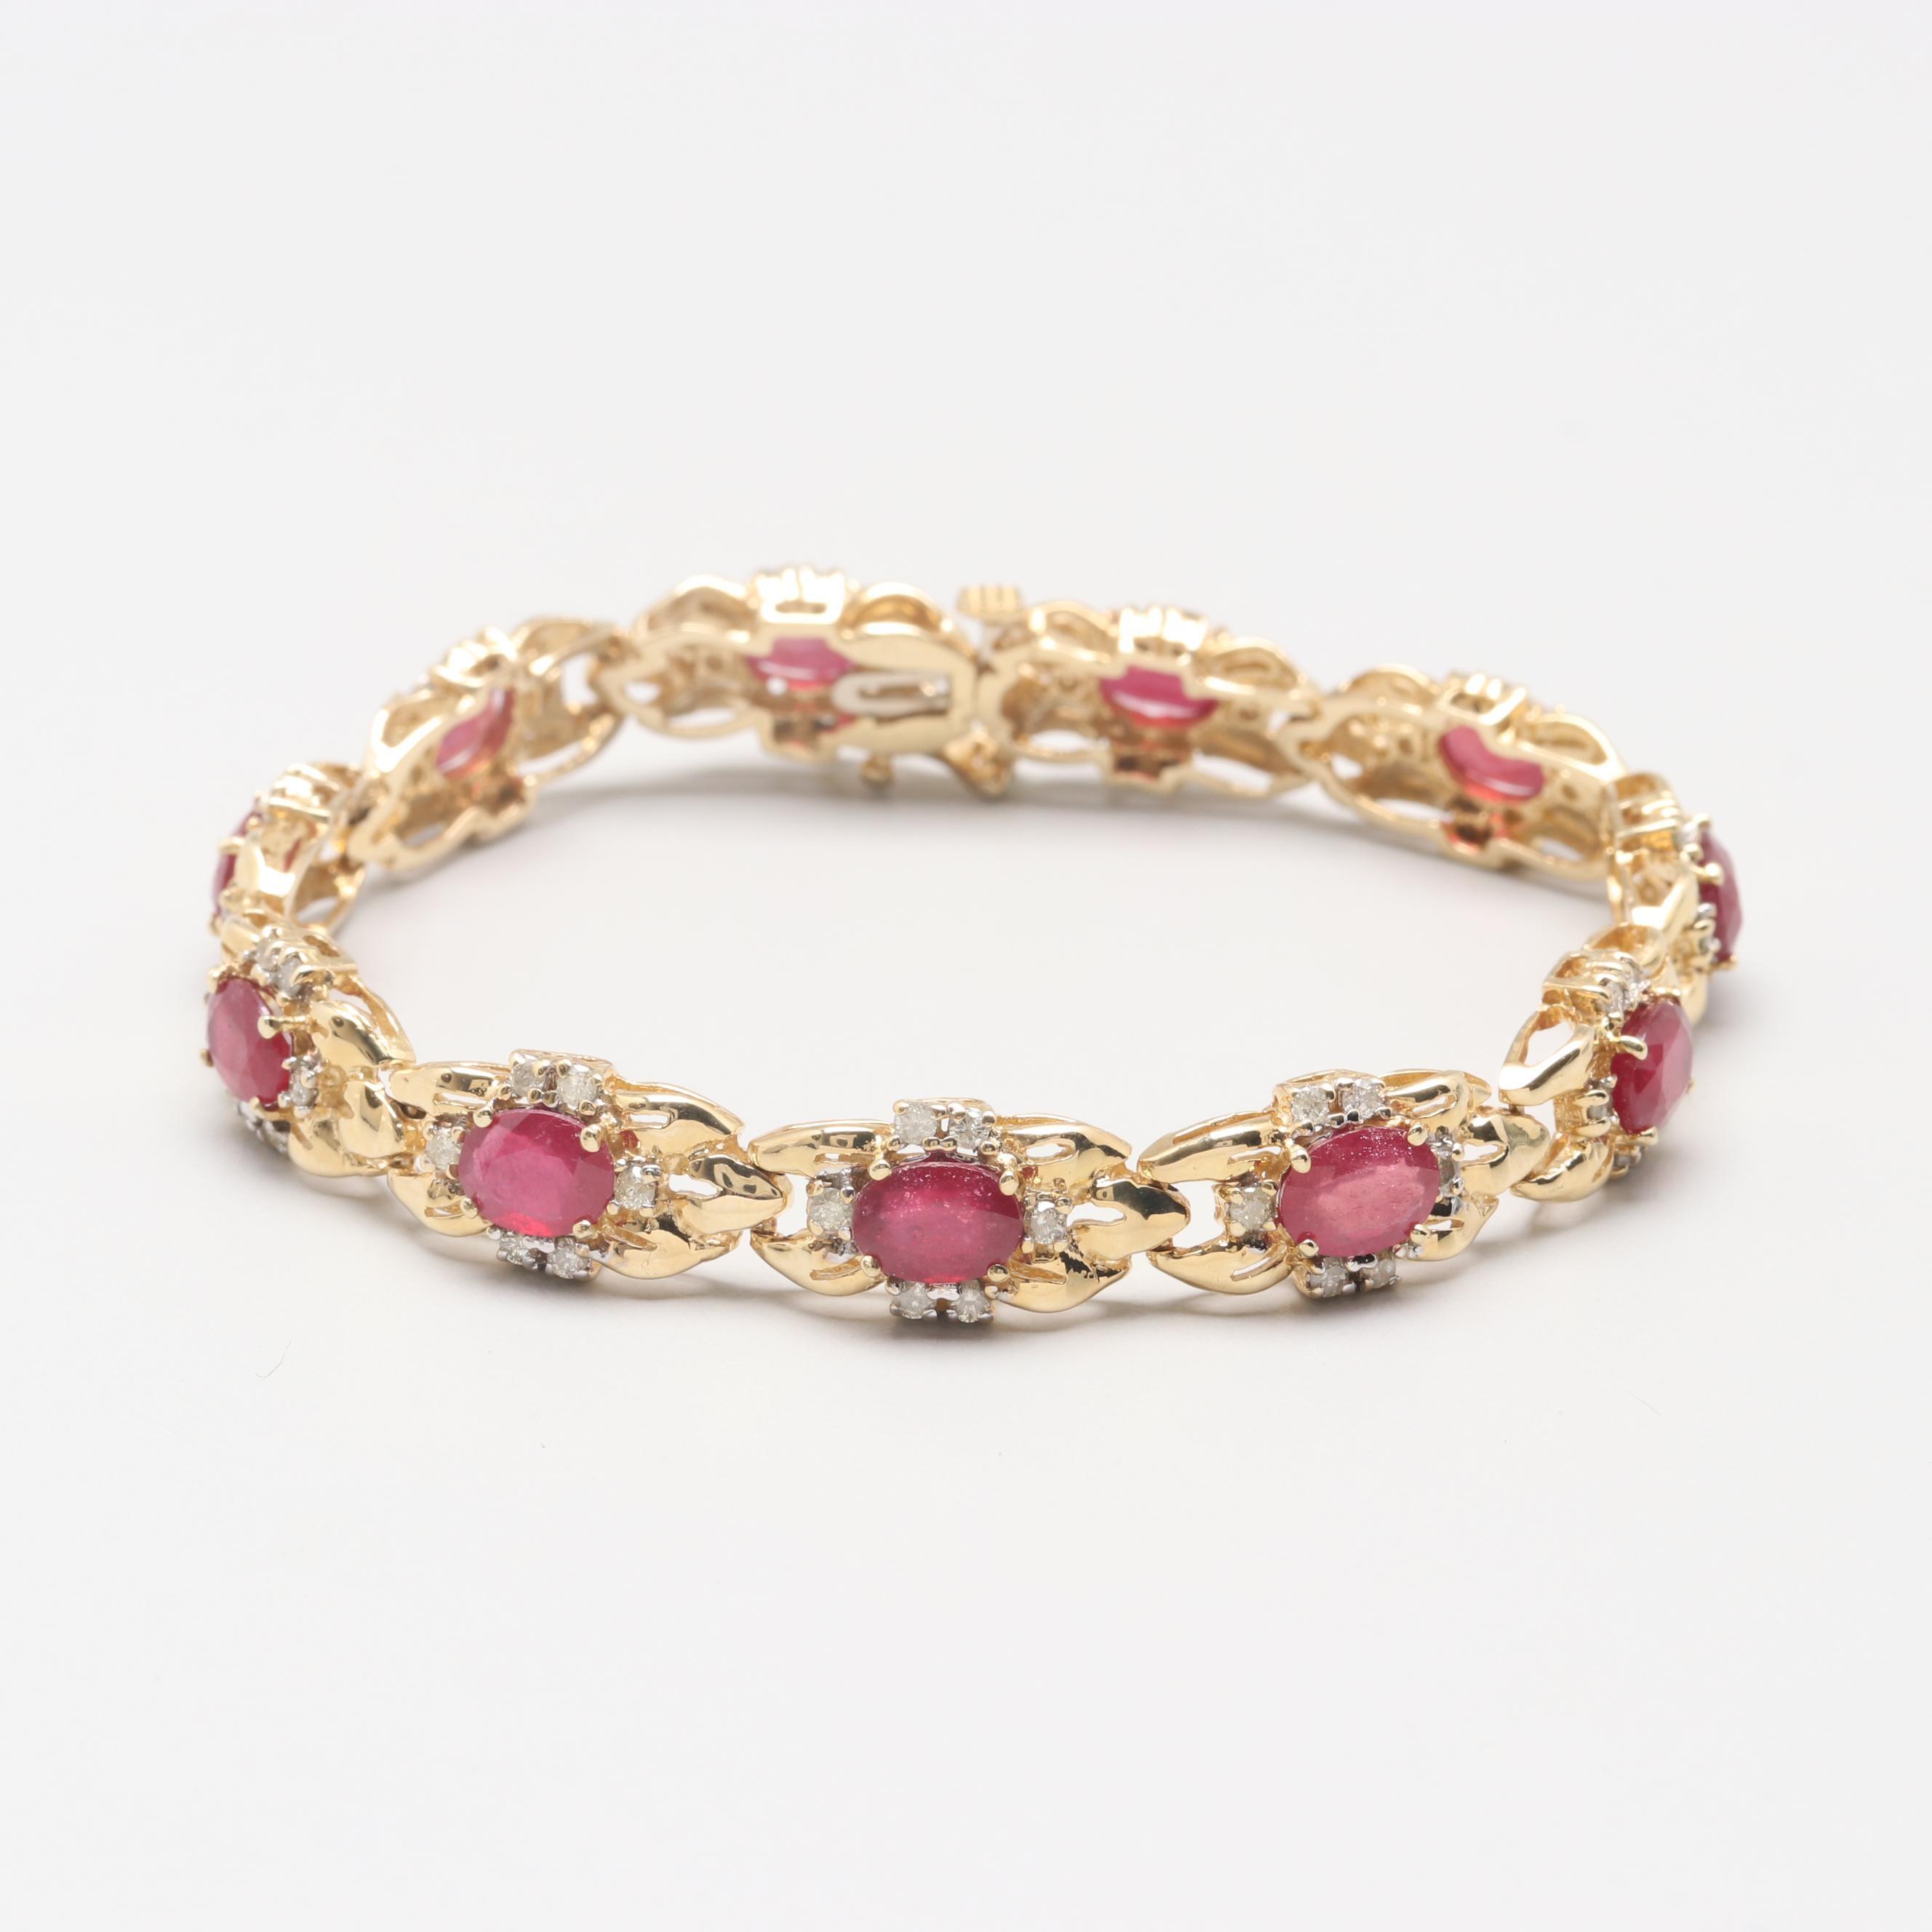 14K Yellow Gold Filled Corundum and 1.07 CTW Diamond Bracelet